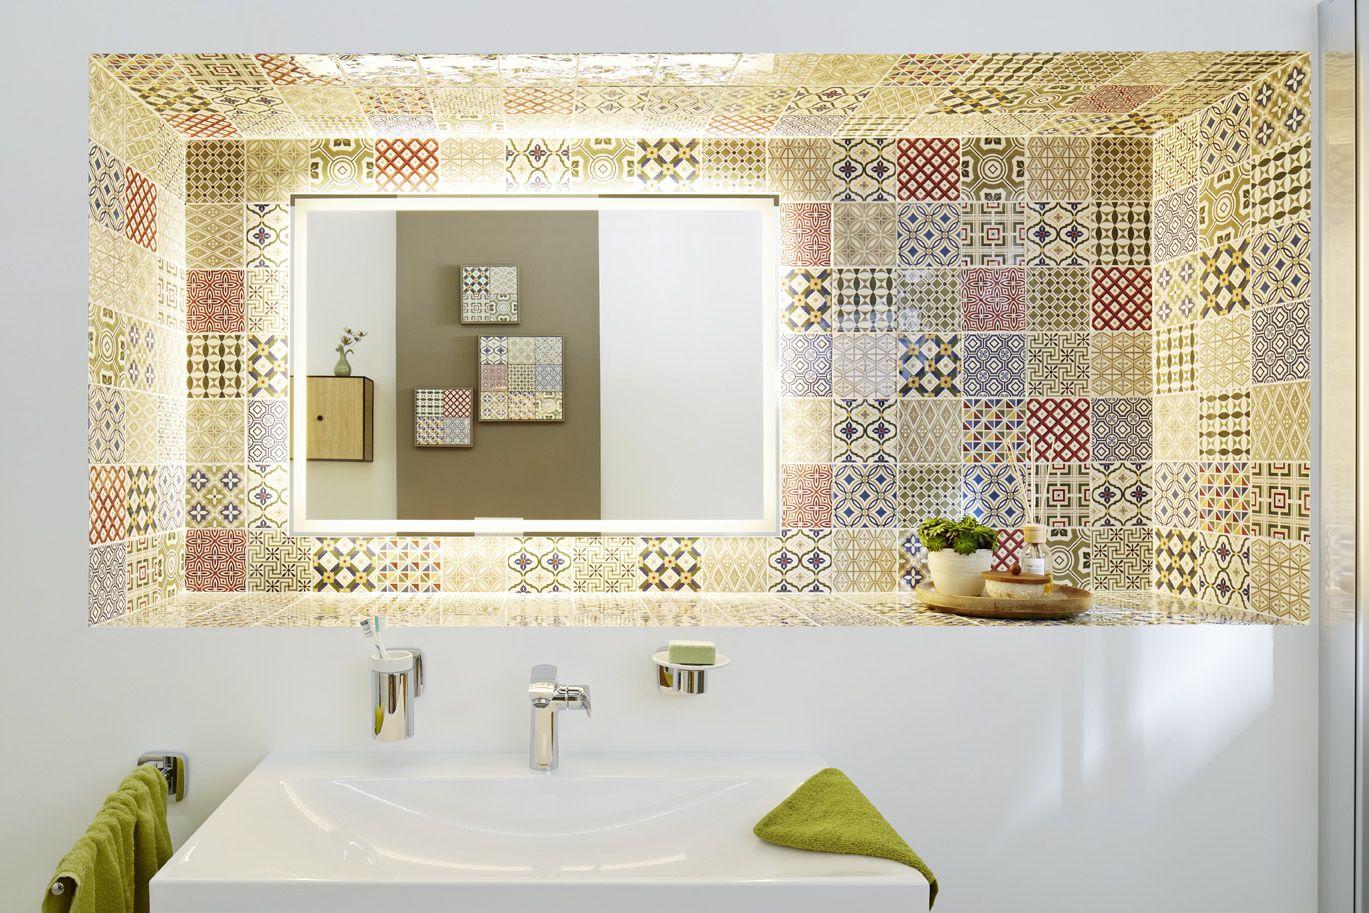 Led Badezimmerspiegel ~ Sun ti meg interieur badspiegel mit integrierter led